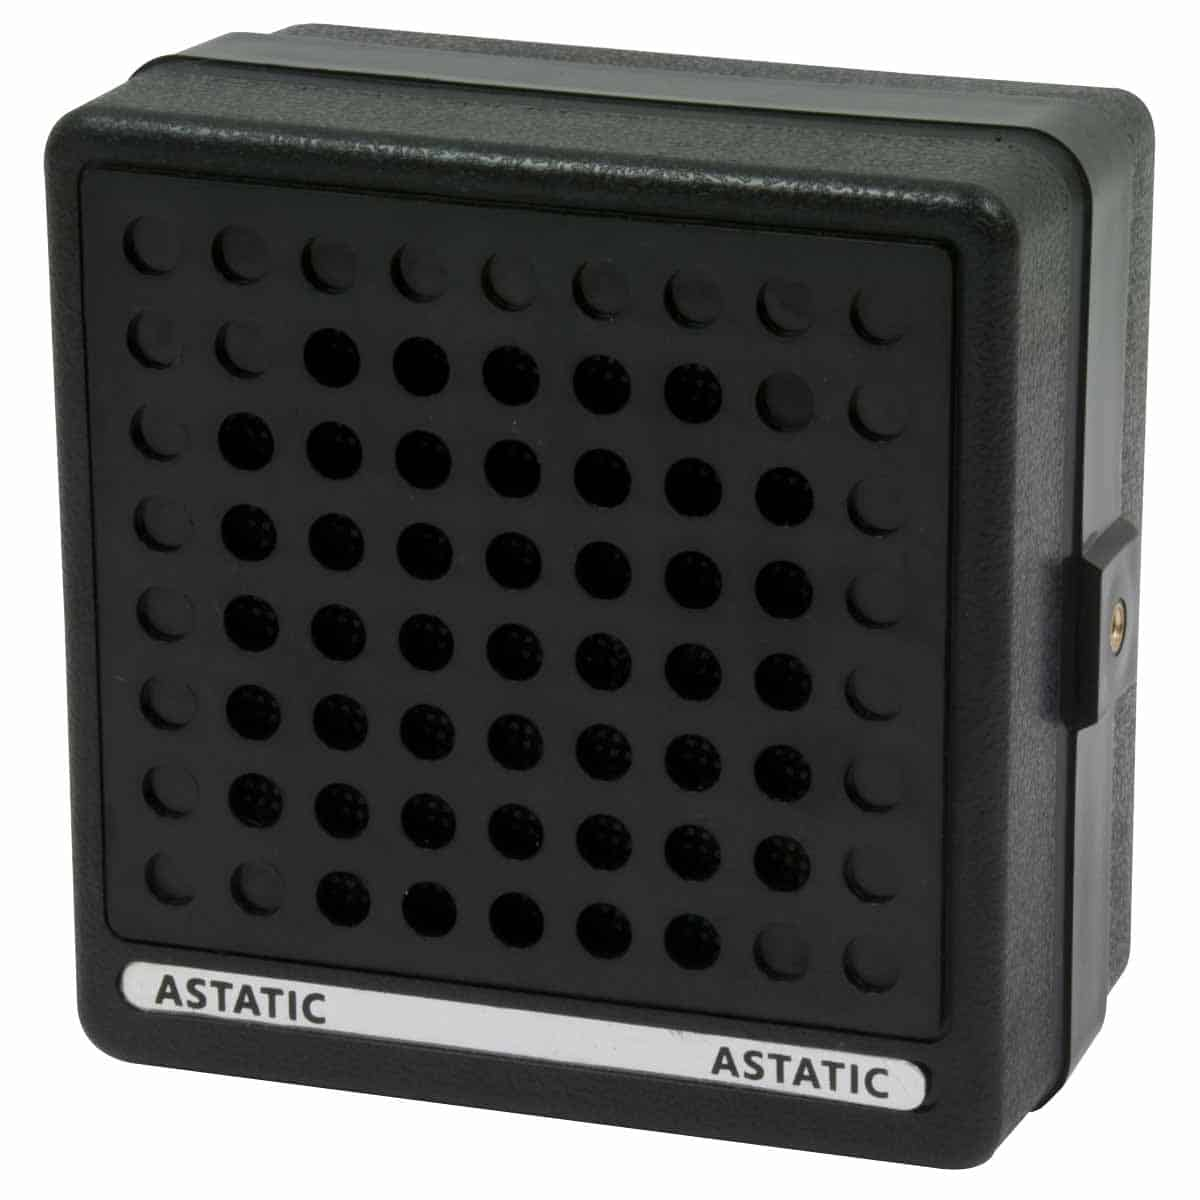 VS2 - Astatic 10 Watts 8 Ohm Classic Presidential External Speaker